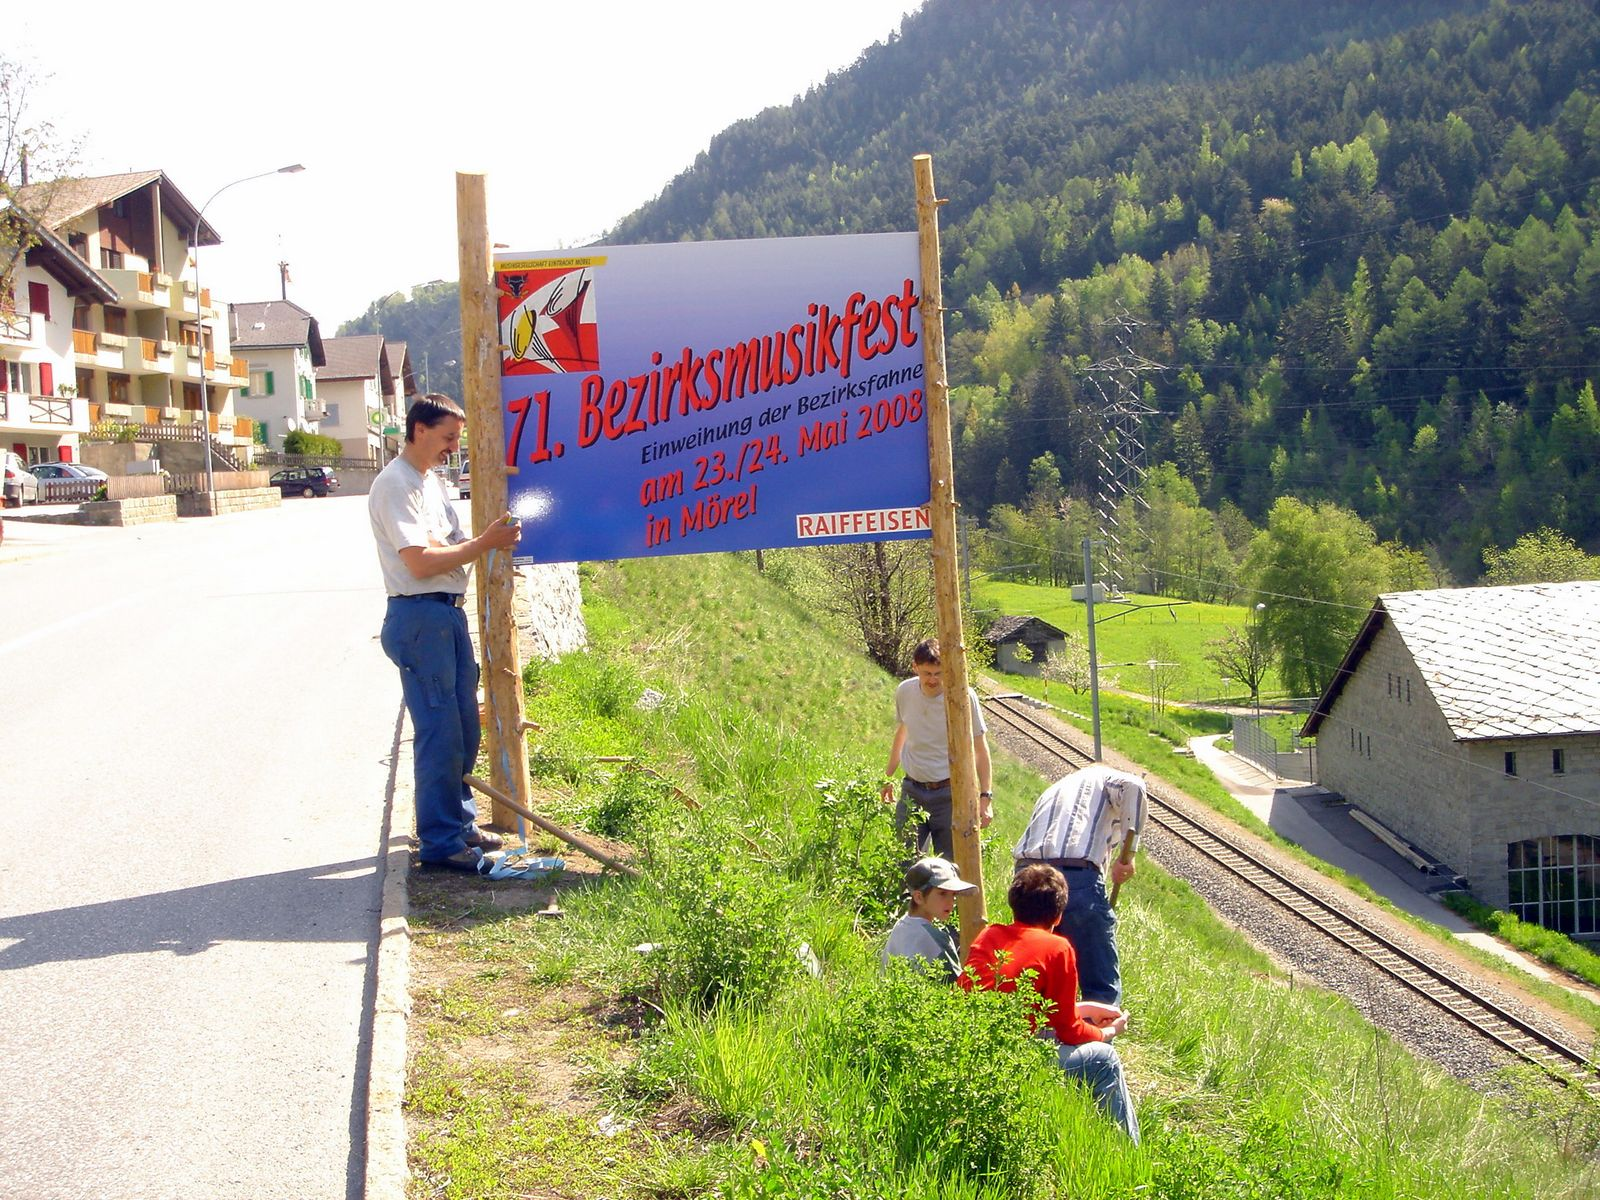 2008 Plakat Aufbau 71. Bezirksmusikfest in Mörel